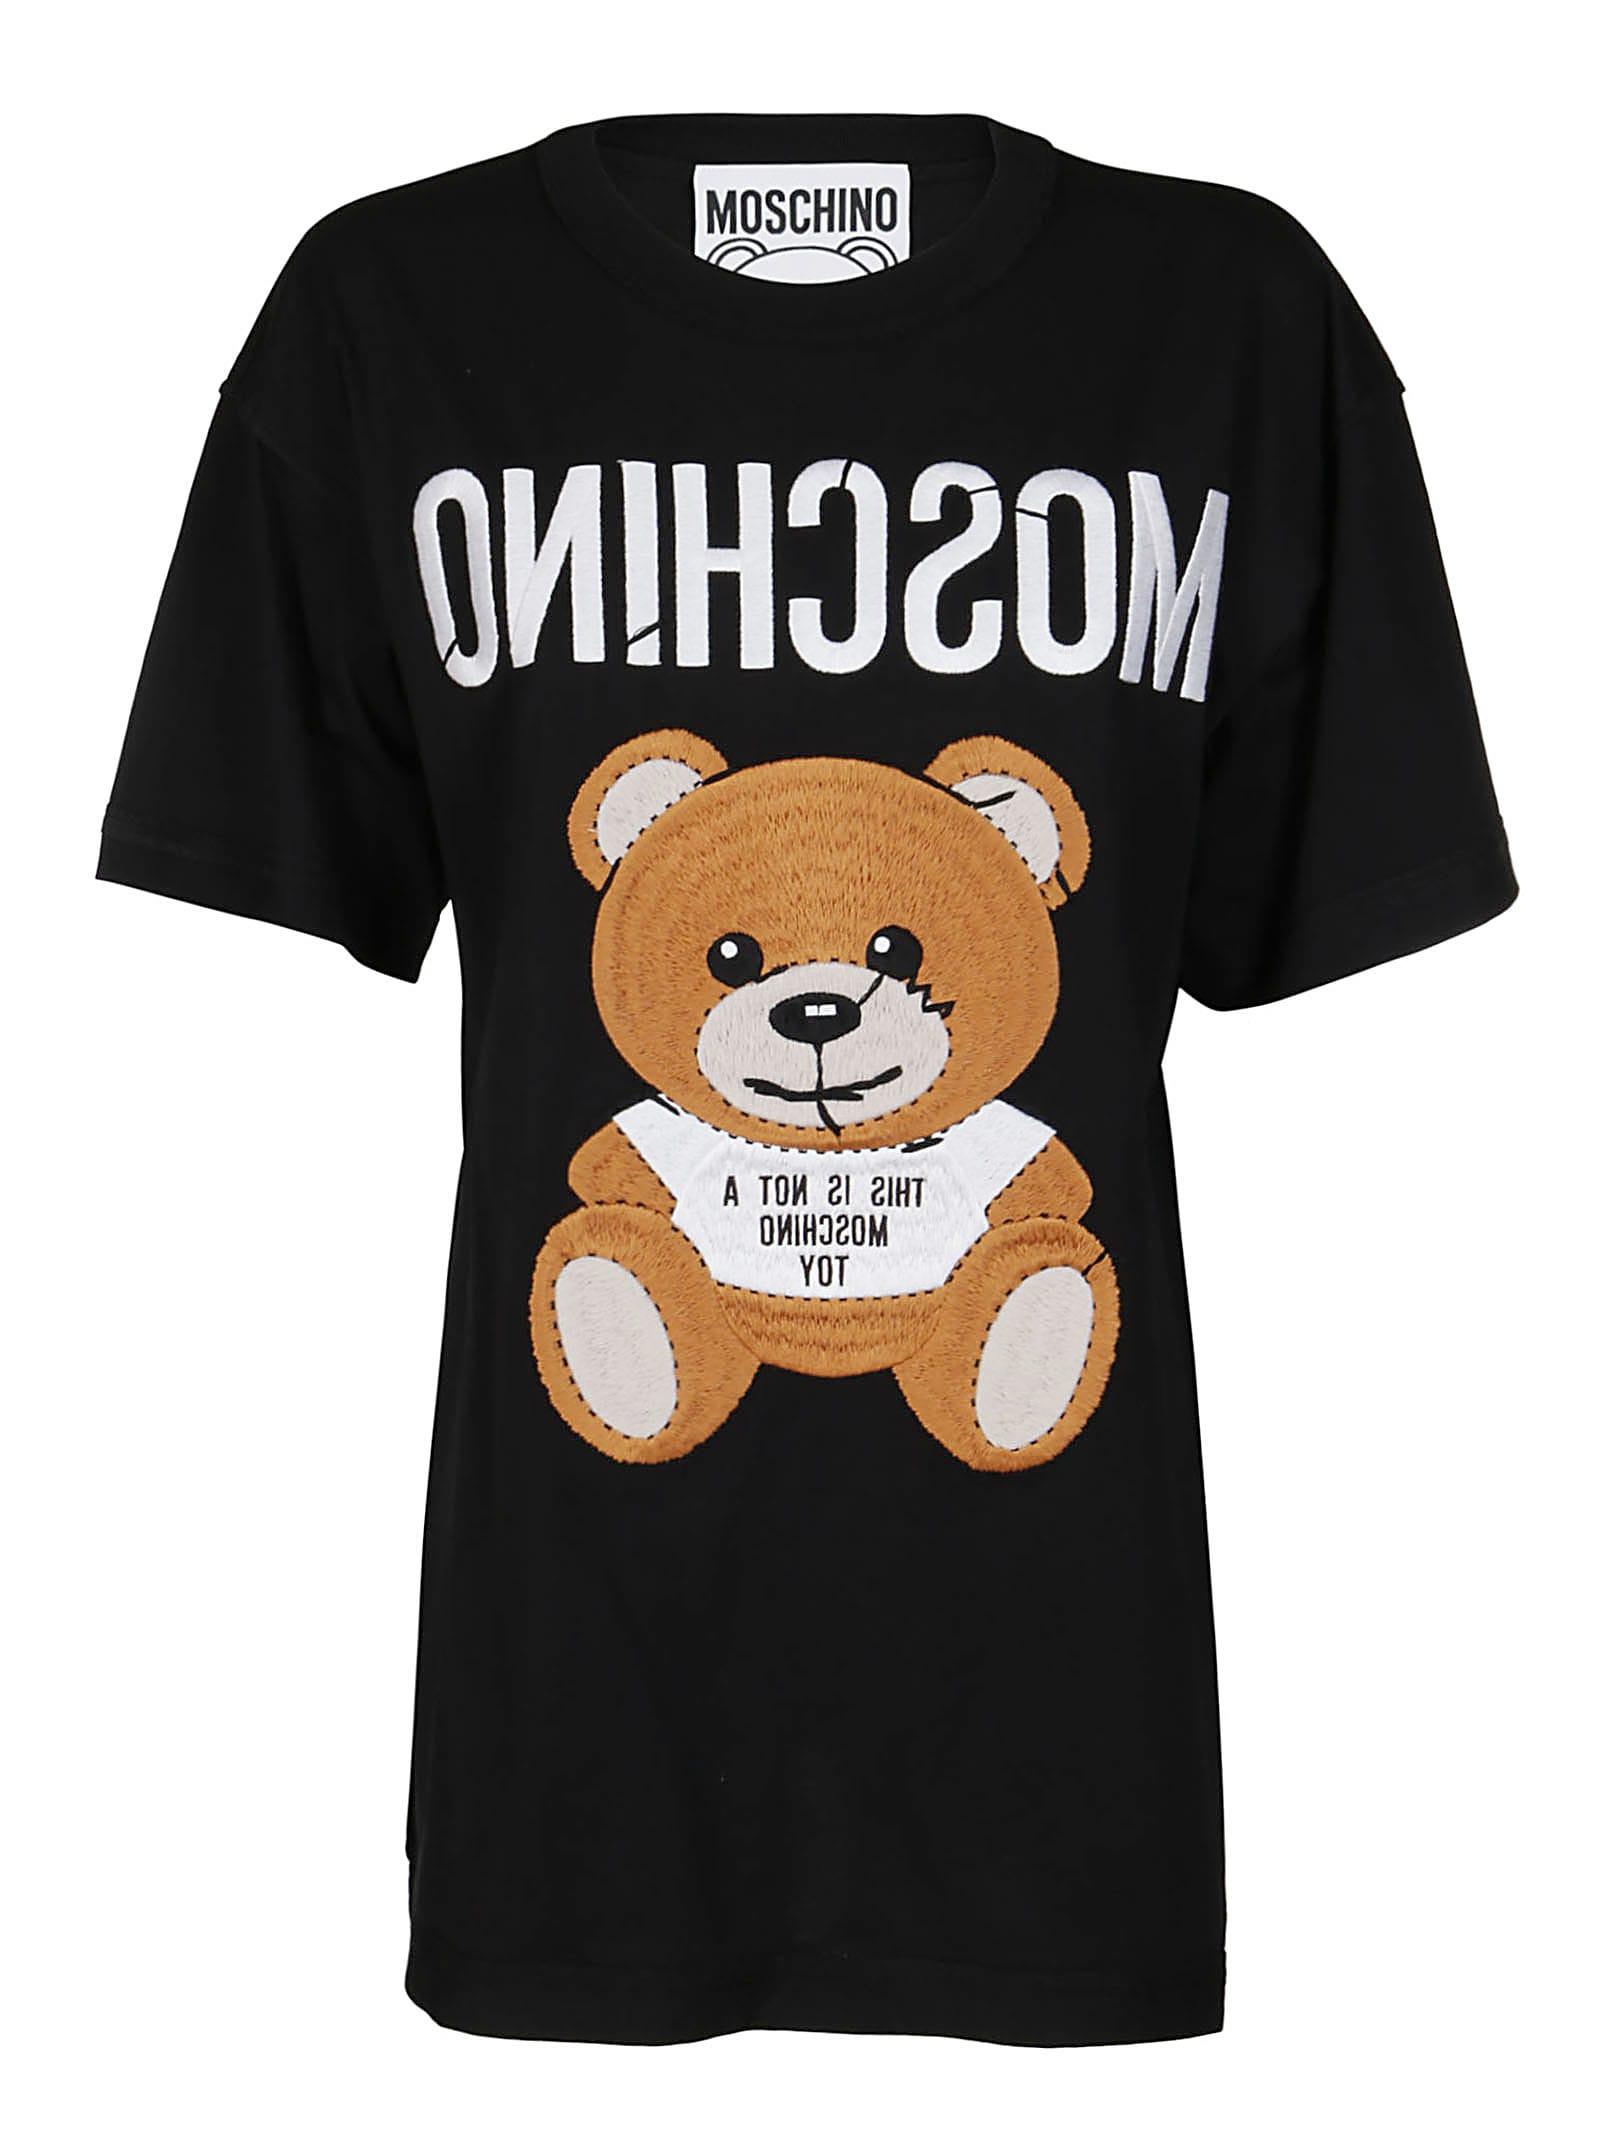 Moschino BLACK COTTON TEDDY T-SHIRT